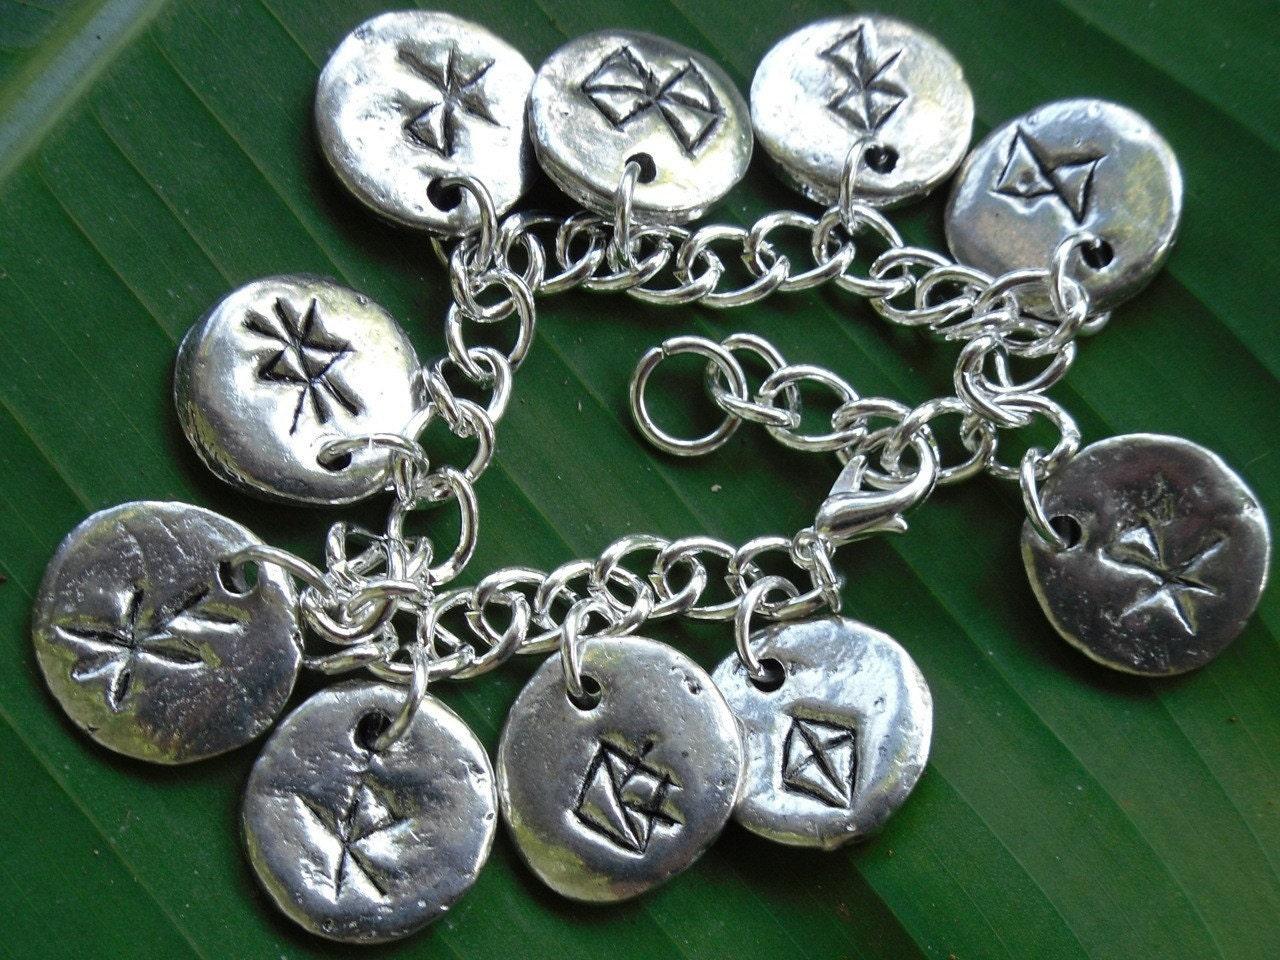 Bind Runes Charm Bracelet Ancient Runic Symbols On Chunky